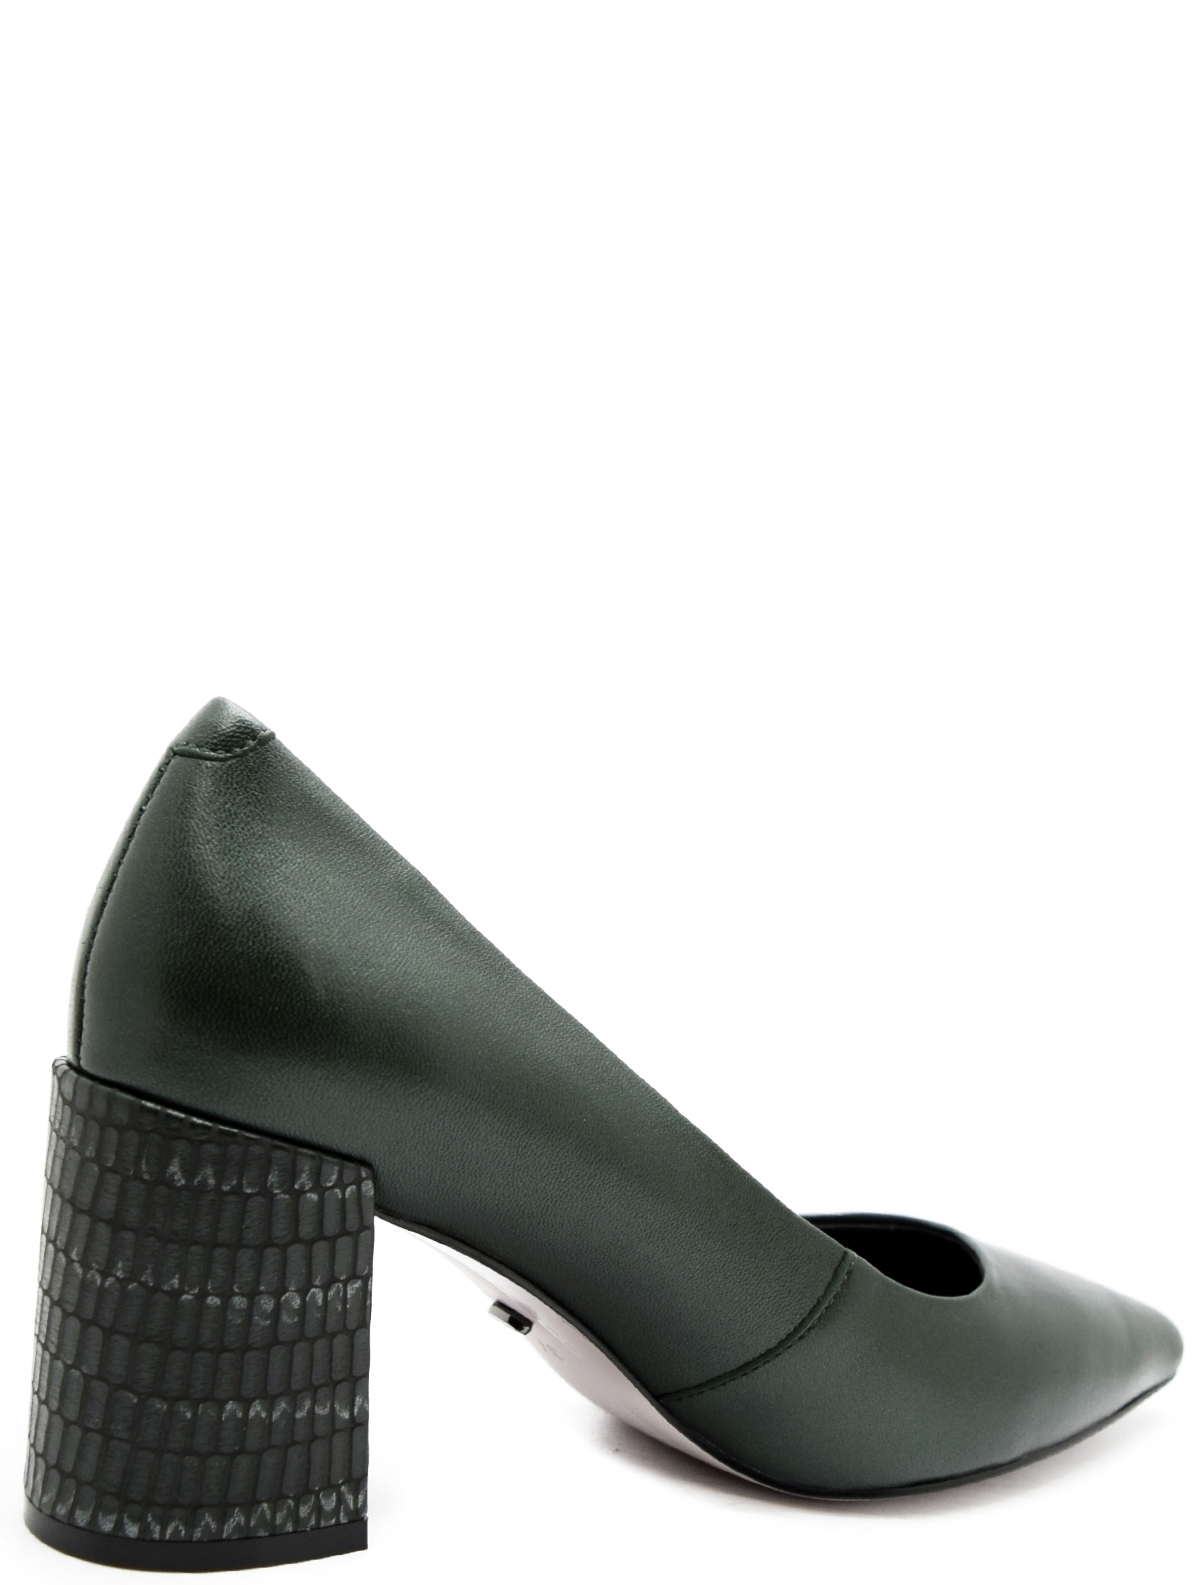 GRACIANA W2225-C06-11 женские туфли